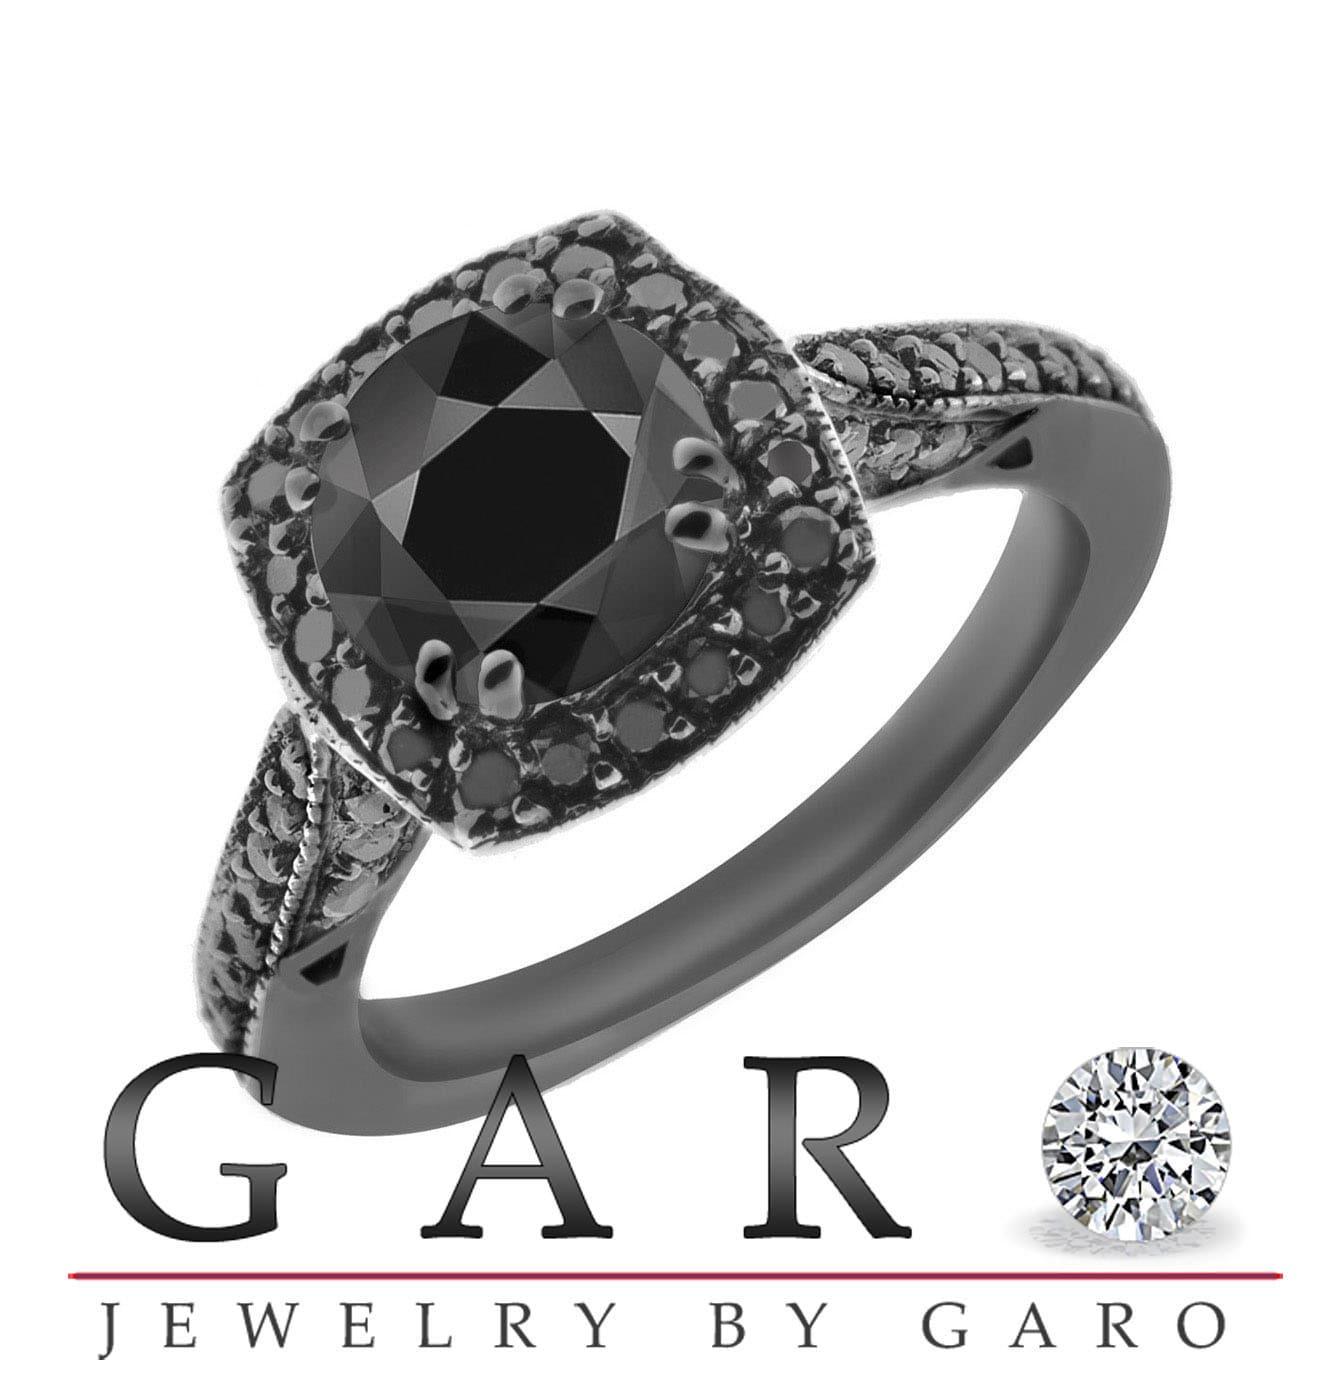 Black diamond engagement rings blue diamond engagement rings cartier